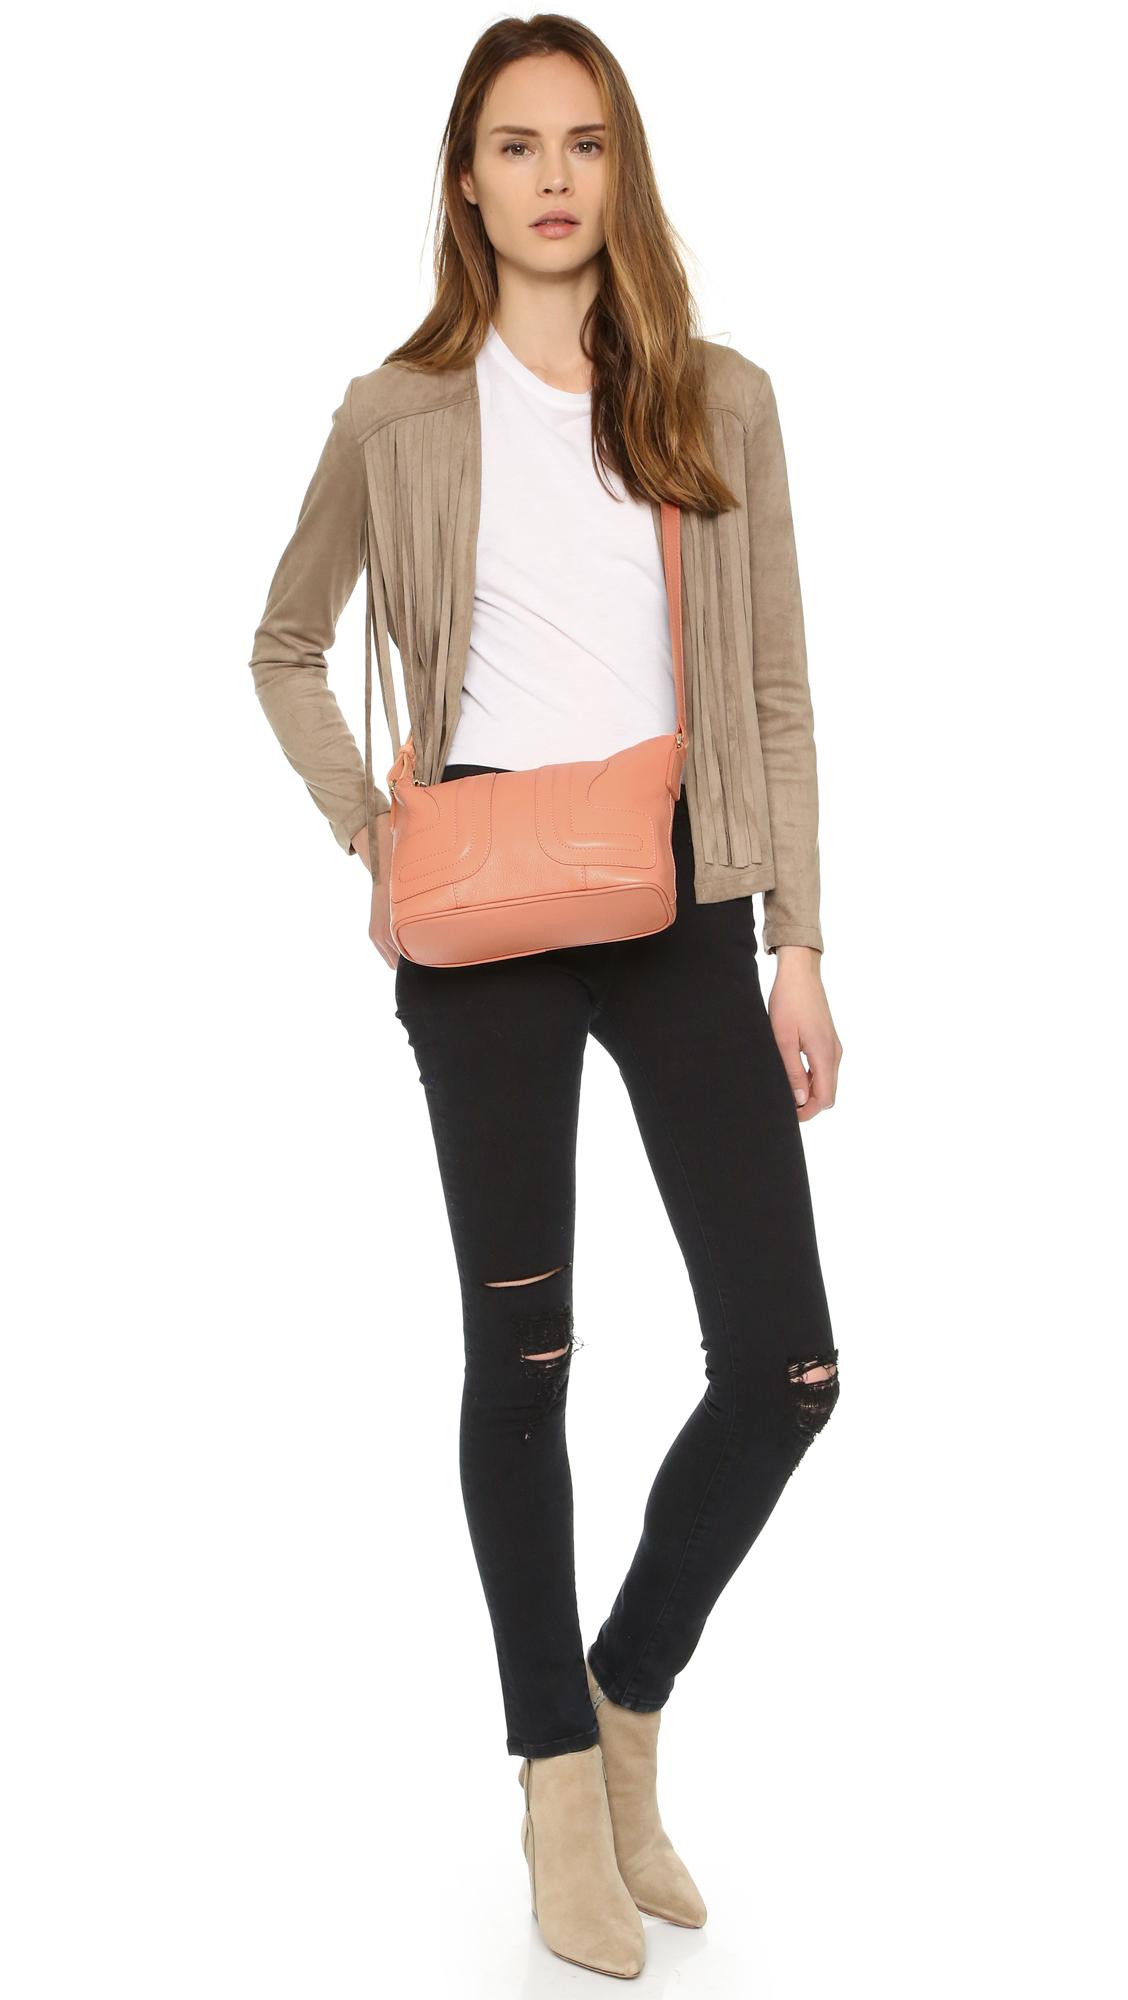 fake chloe purse - See by chlo�� Kay Cross Body Bag in Orange (Sweet Peach) | Lyst